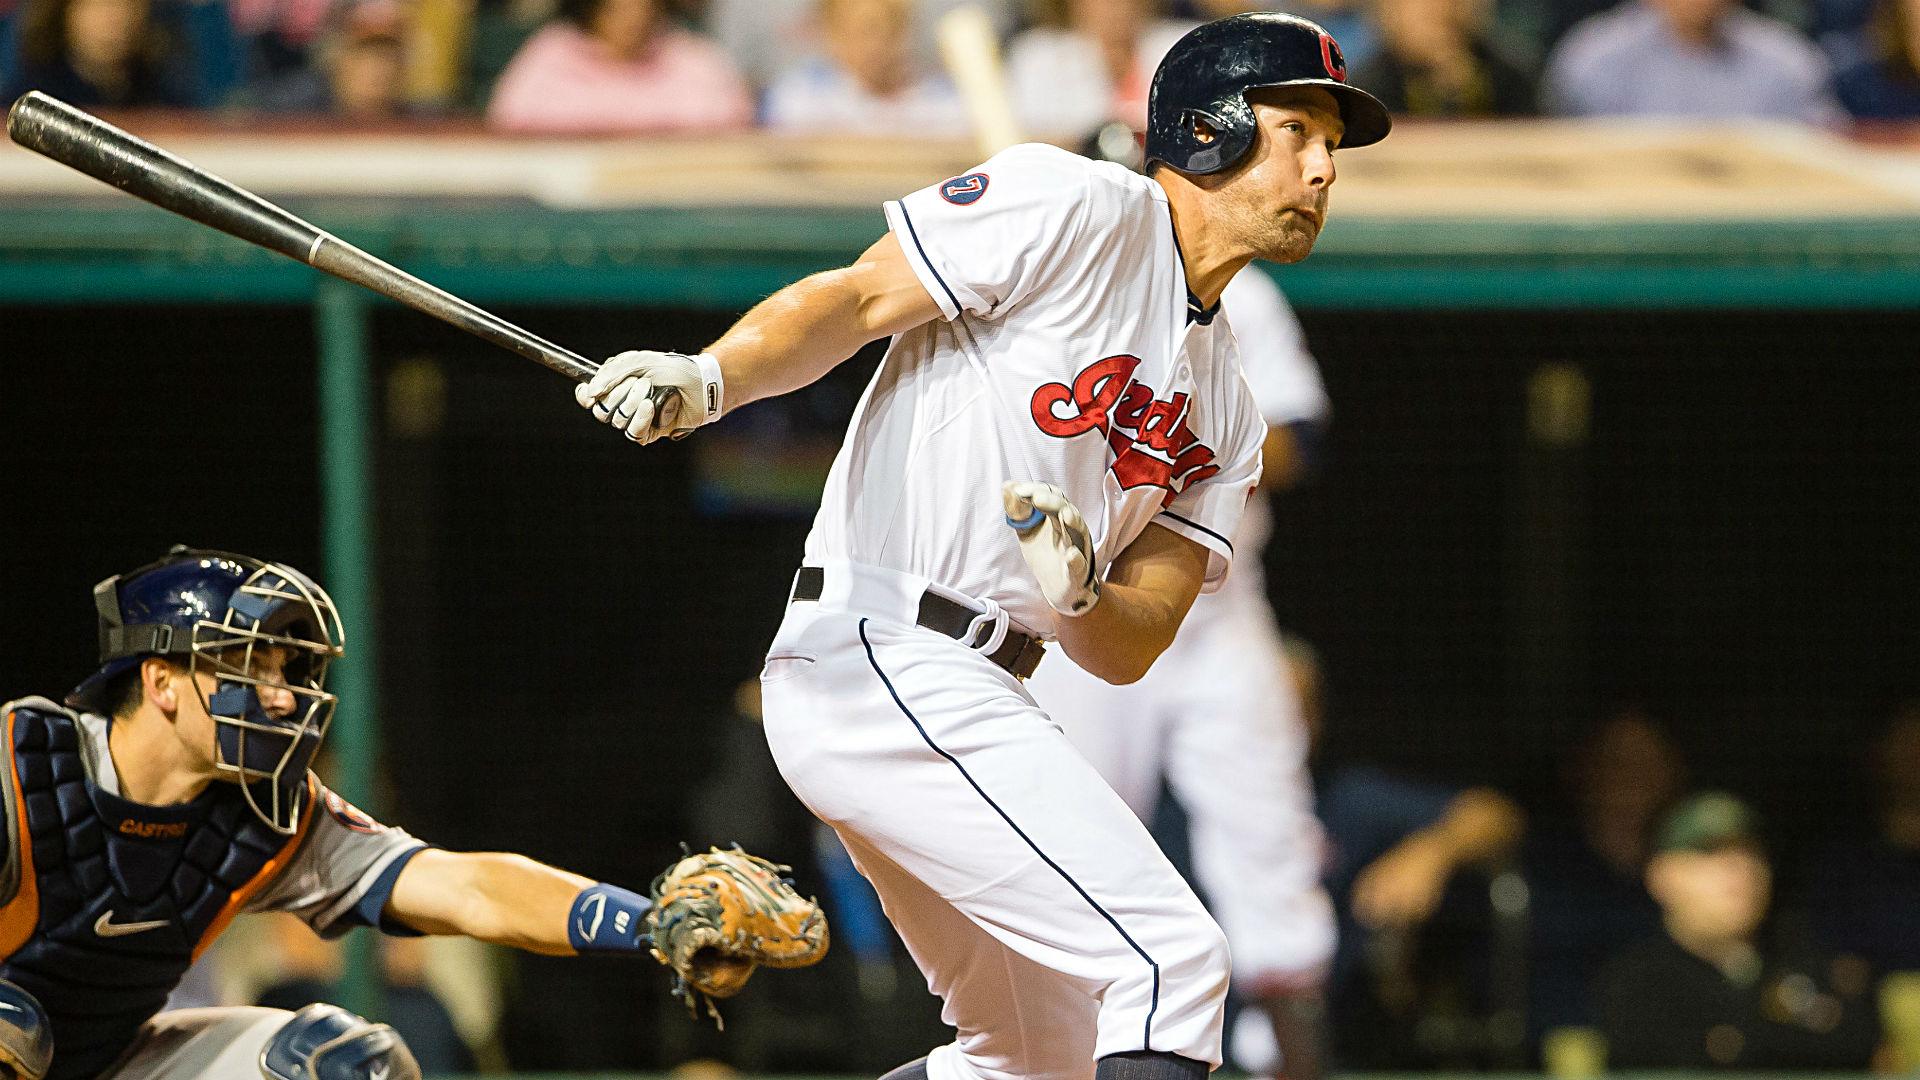 MLB trade rumors: Angels acquire OFs David Murphy, David DeJesus in separate deals